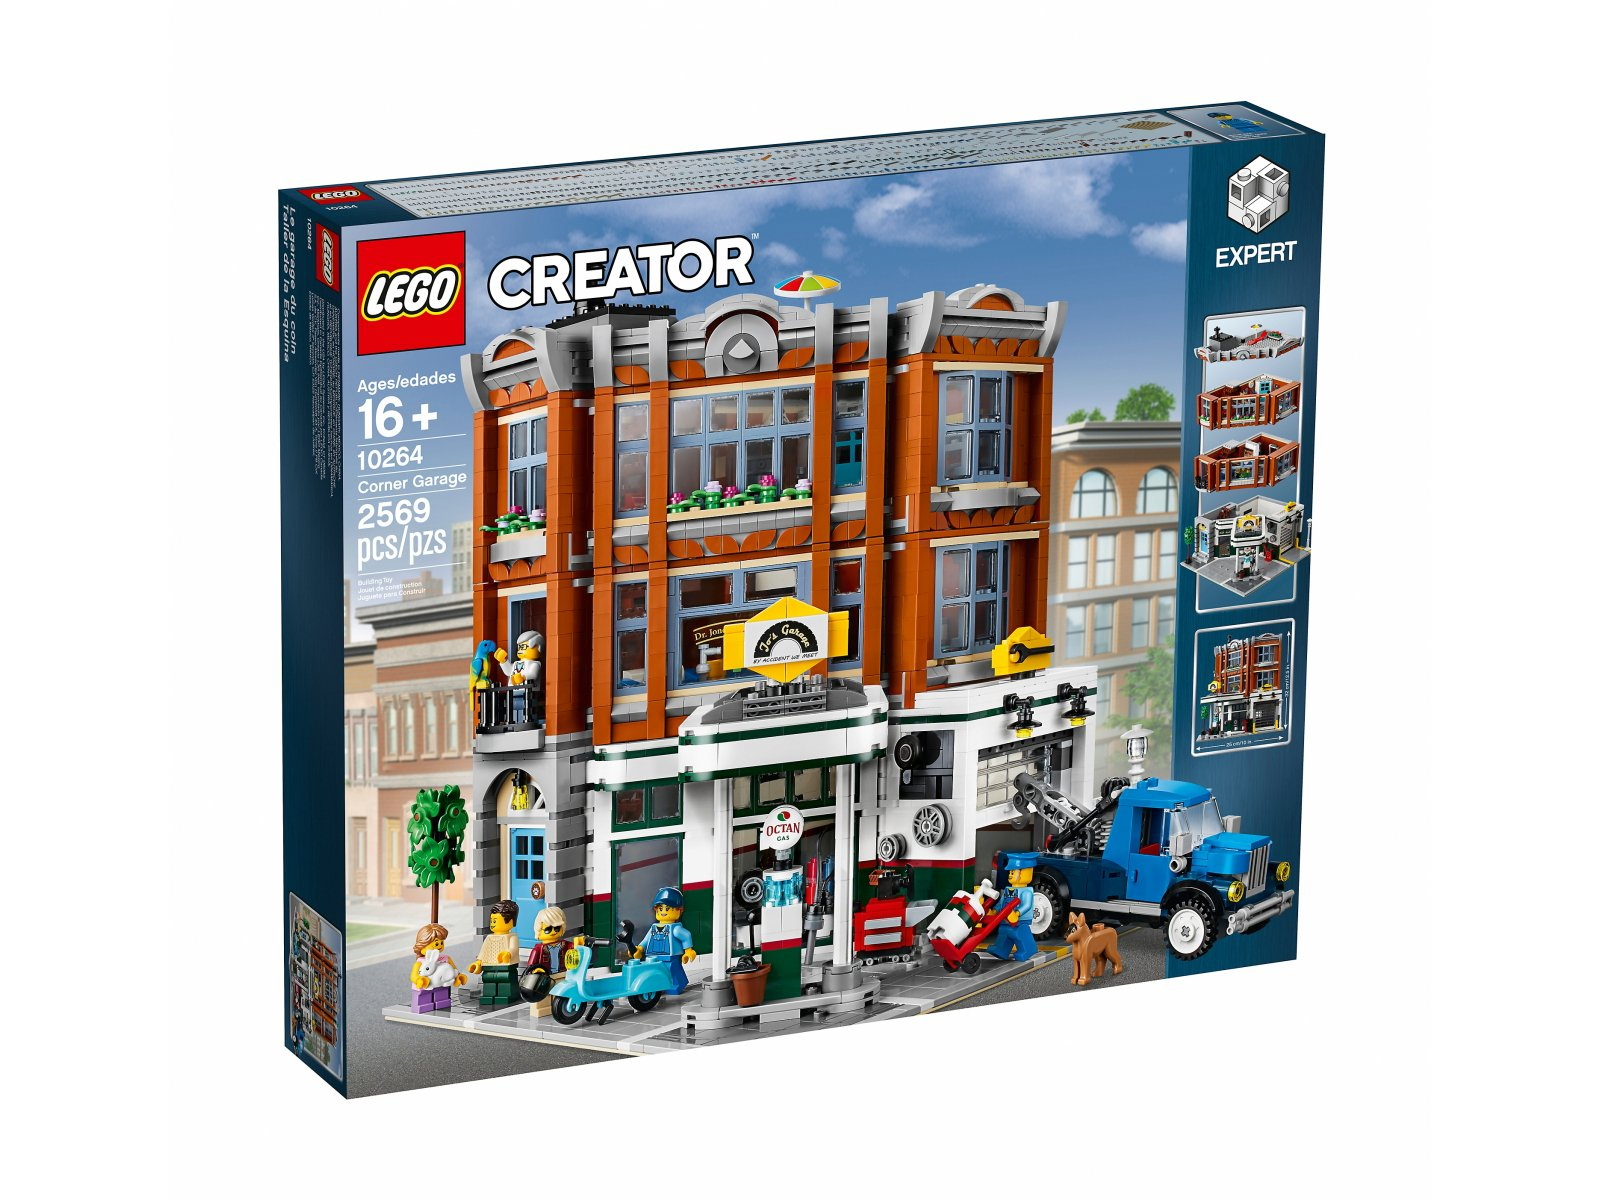 LEGO 10264 Warsztat na rogu